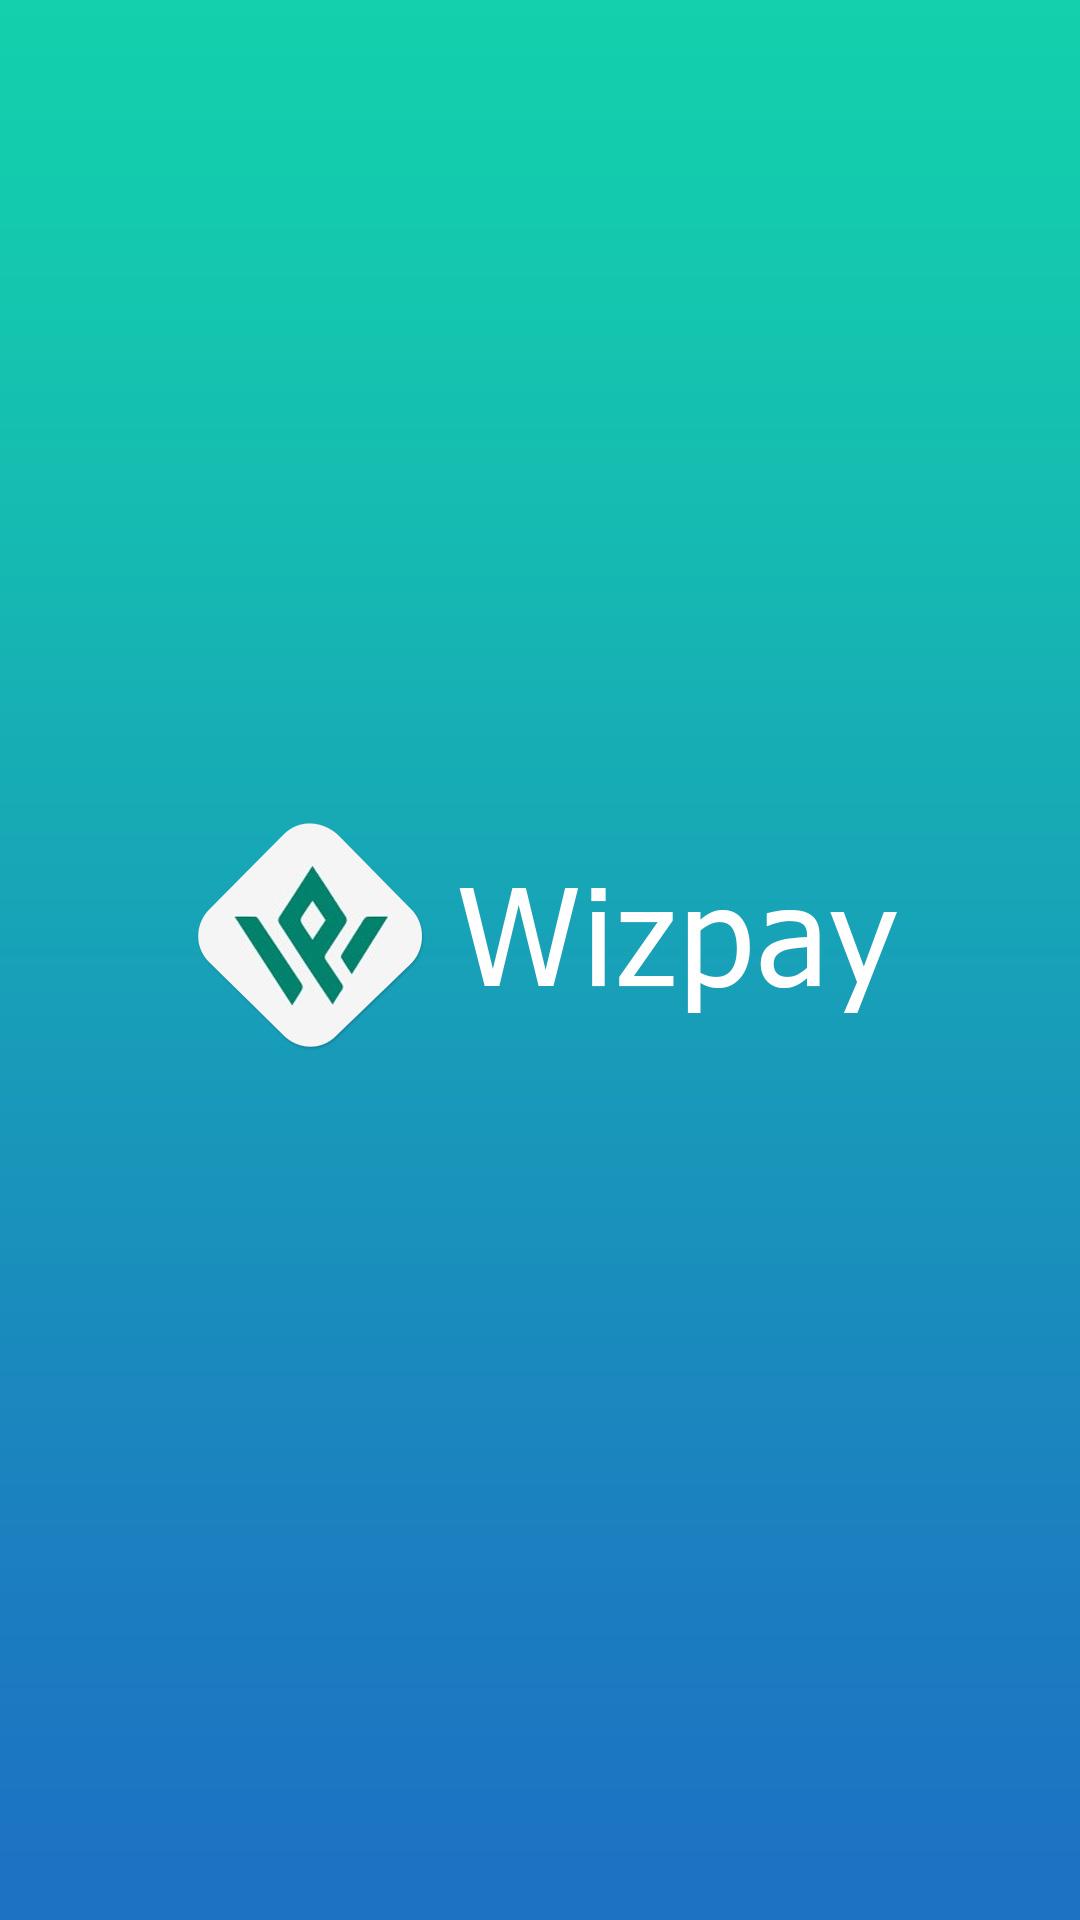 Wizpay Mobile banking, ewallet, POS, inventory management app Screenshot 1